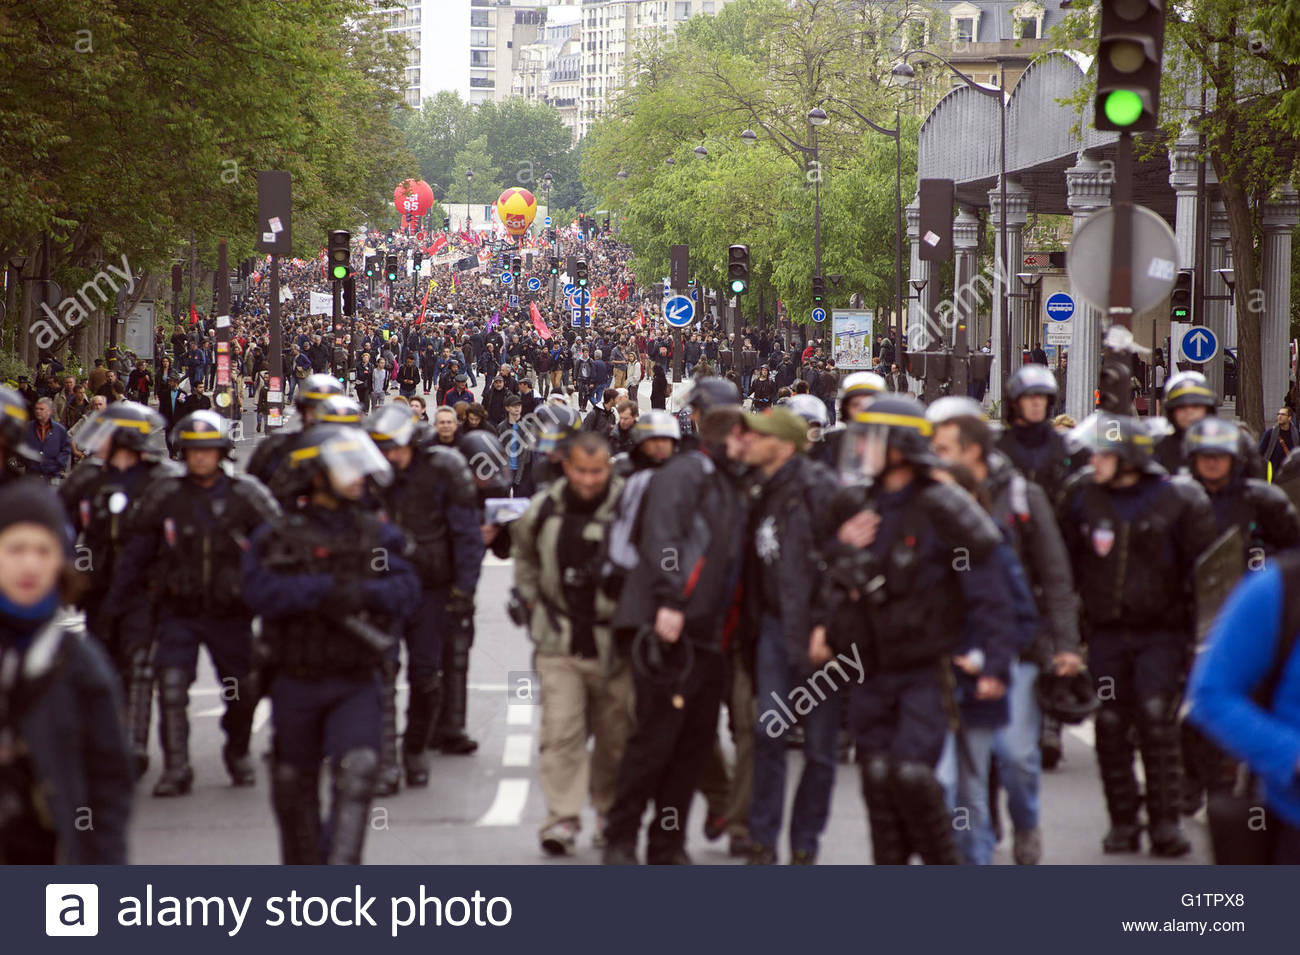 May 68 Paris Stockfotos & May 68 Paris Bilder - Alamy